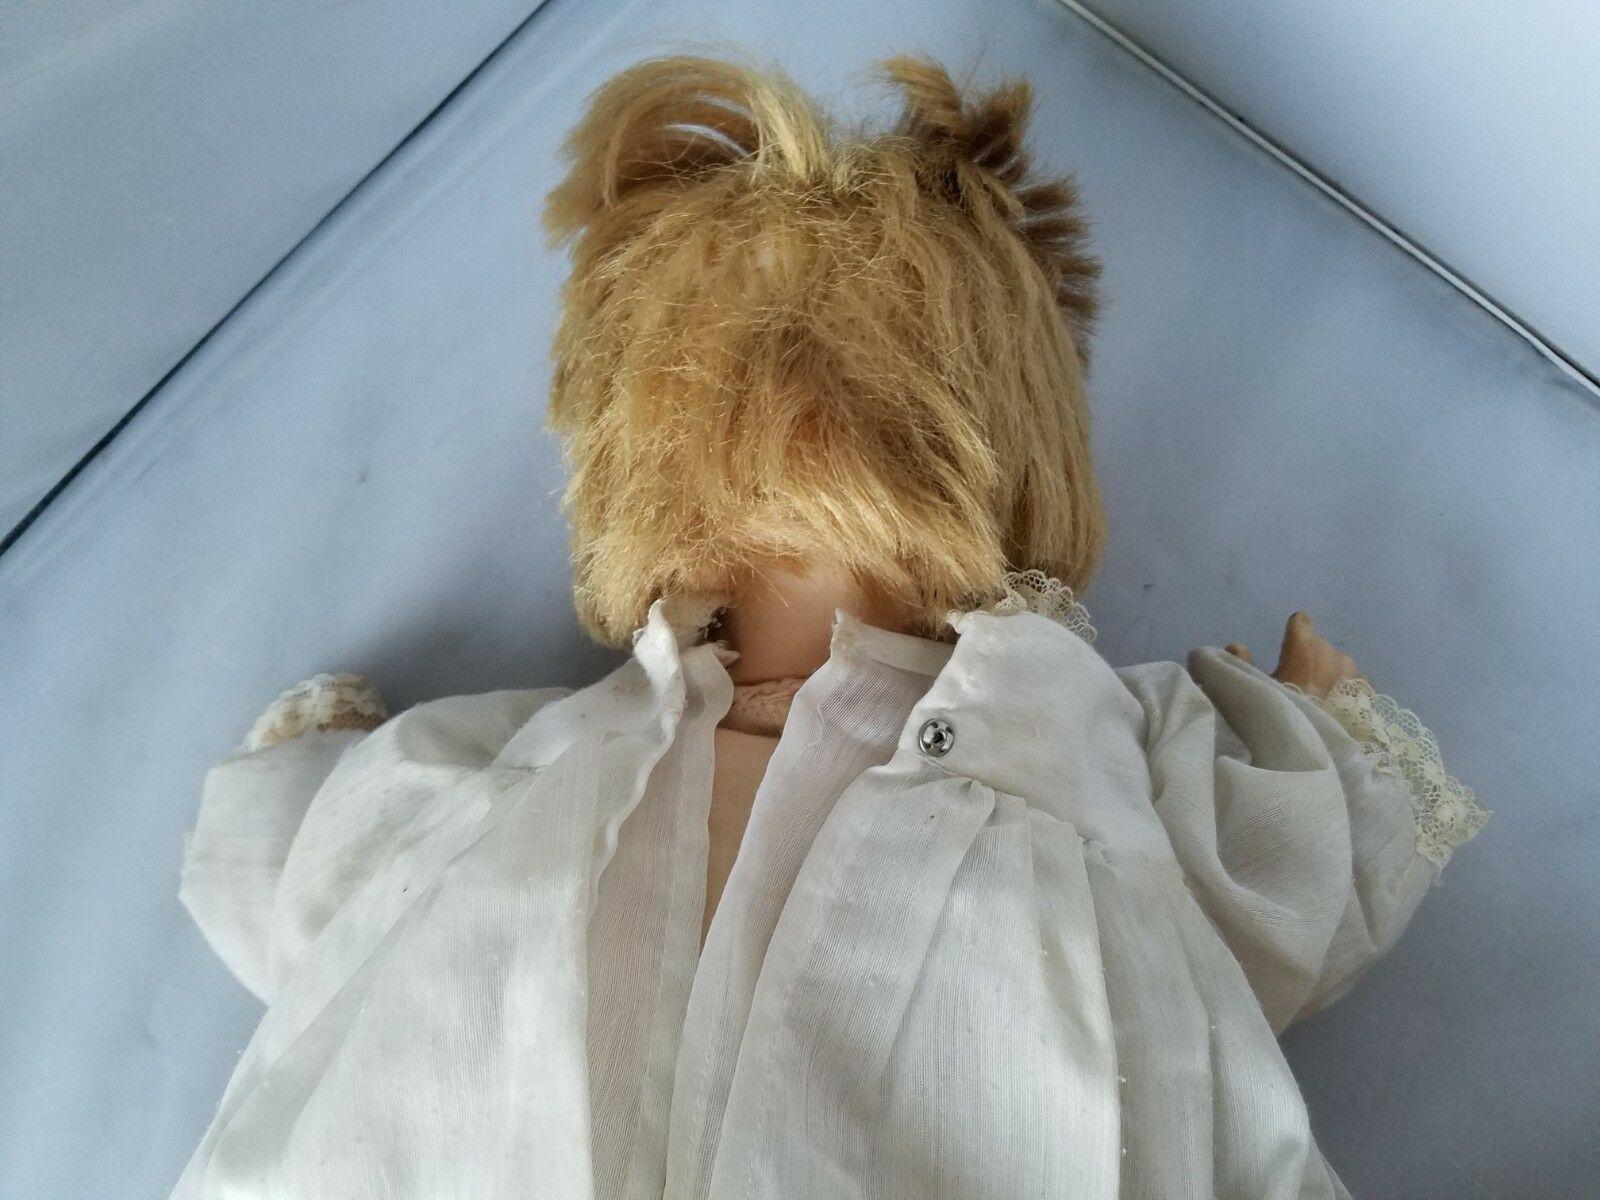 Vogue Dolls 1960's Vintage Baby Doll Blonde Hair Green Eyes White Dress Toy